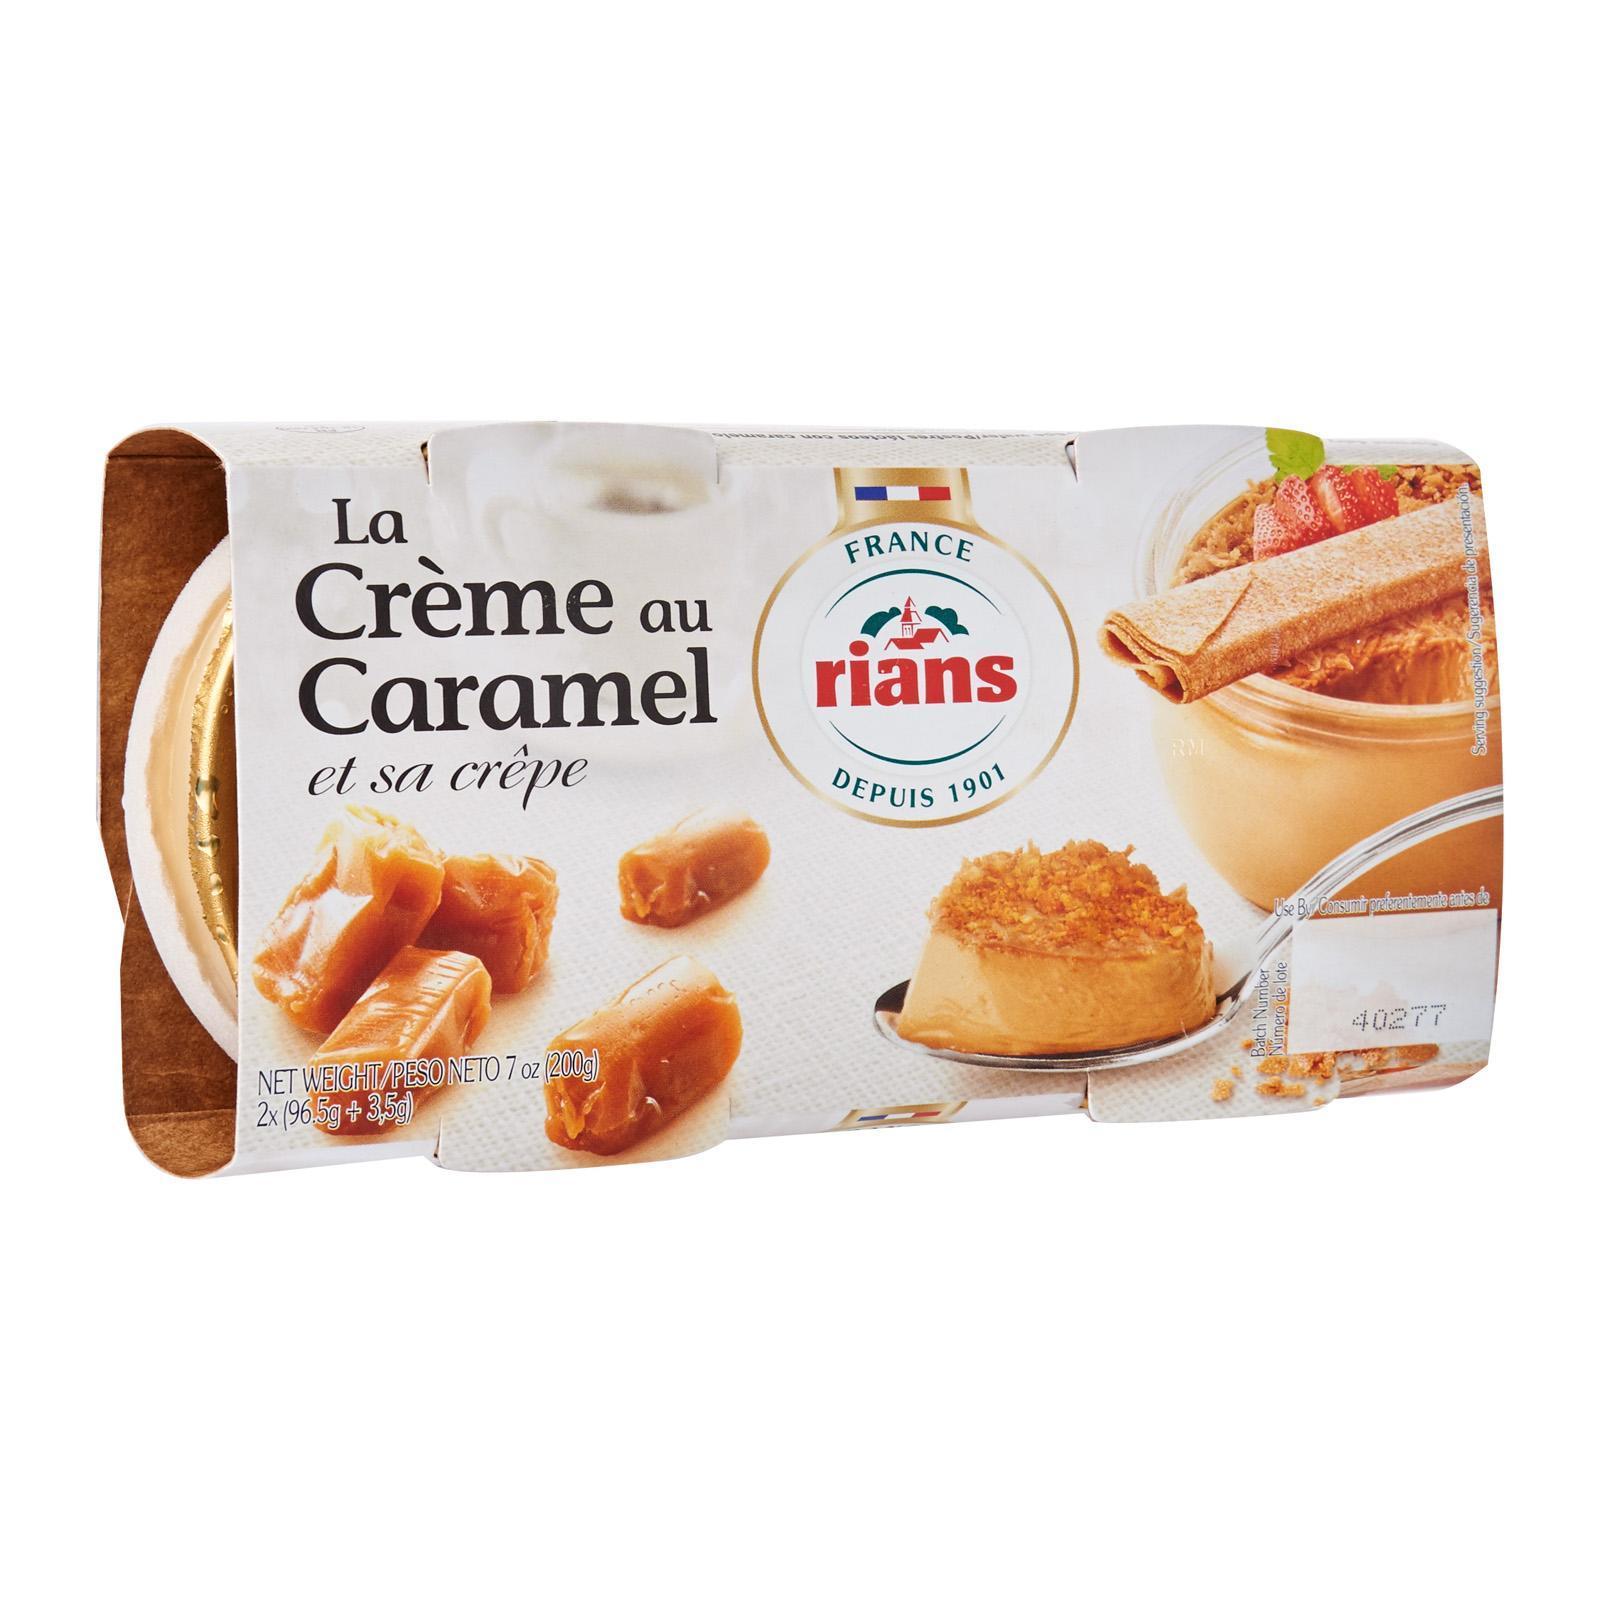 Rians Creme Au Caramel